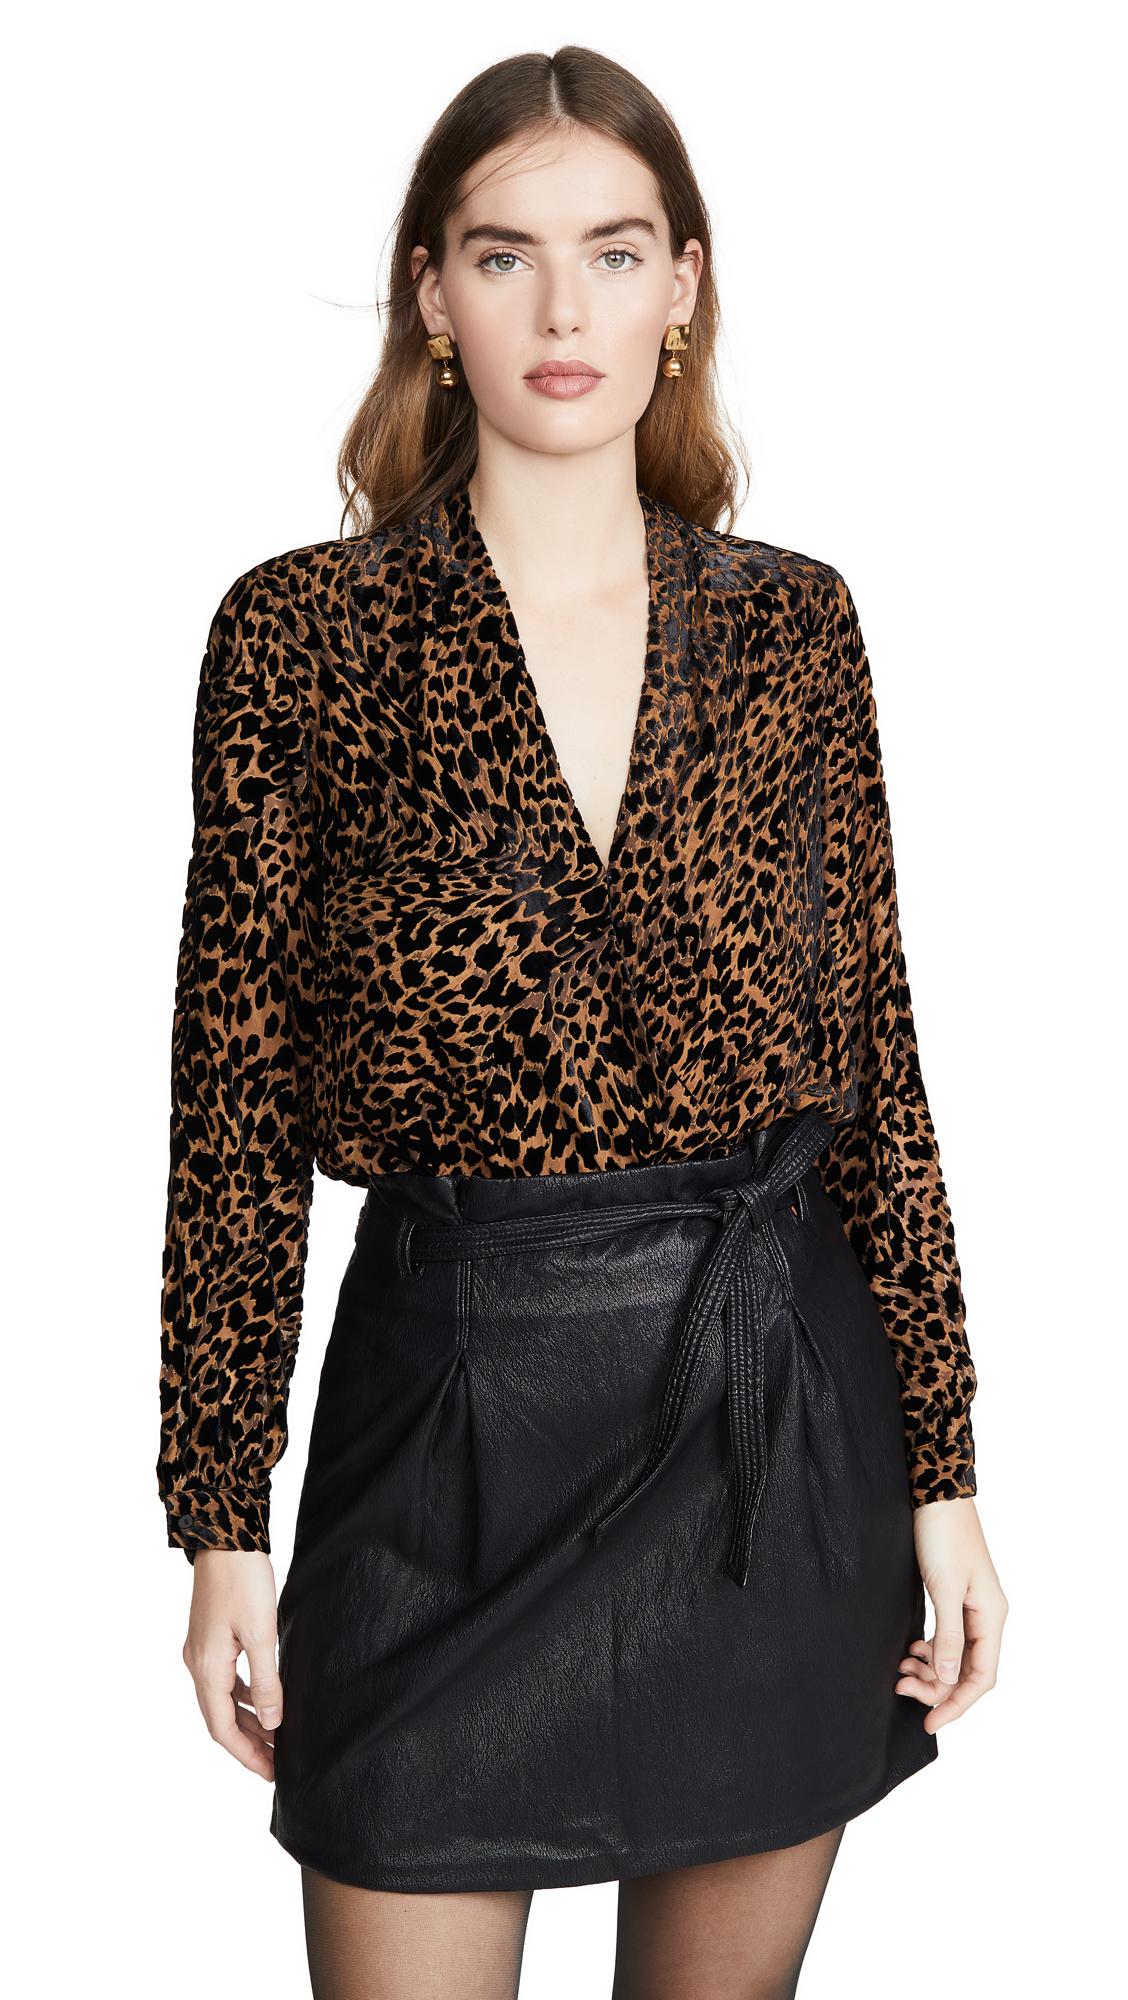 L'AGENCE Lydia Drape Front Blouse - 70% Off Sale